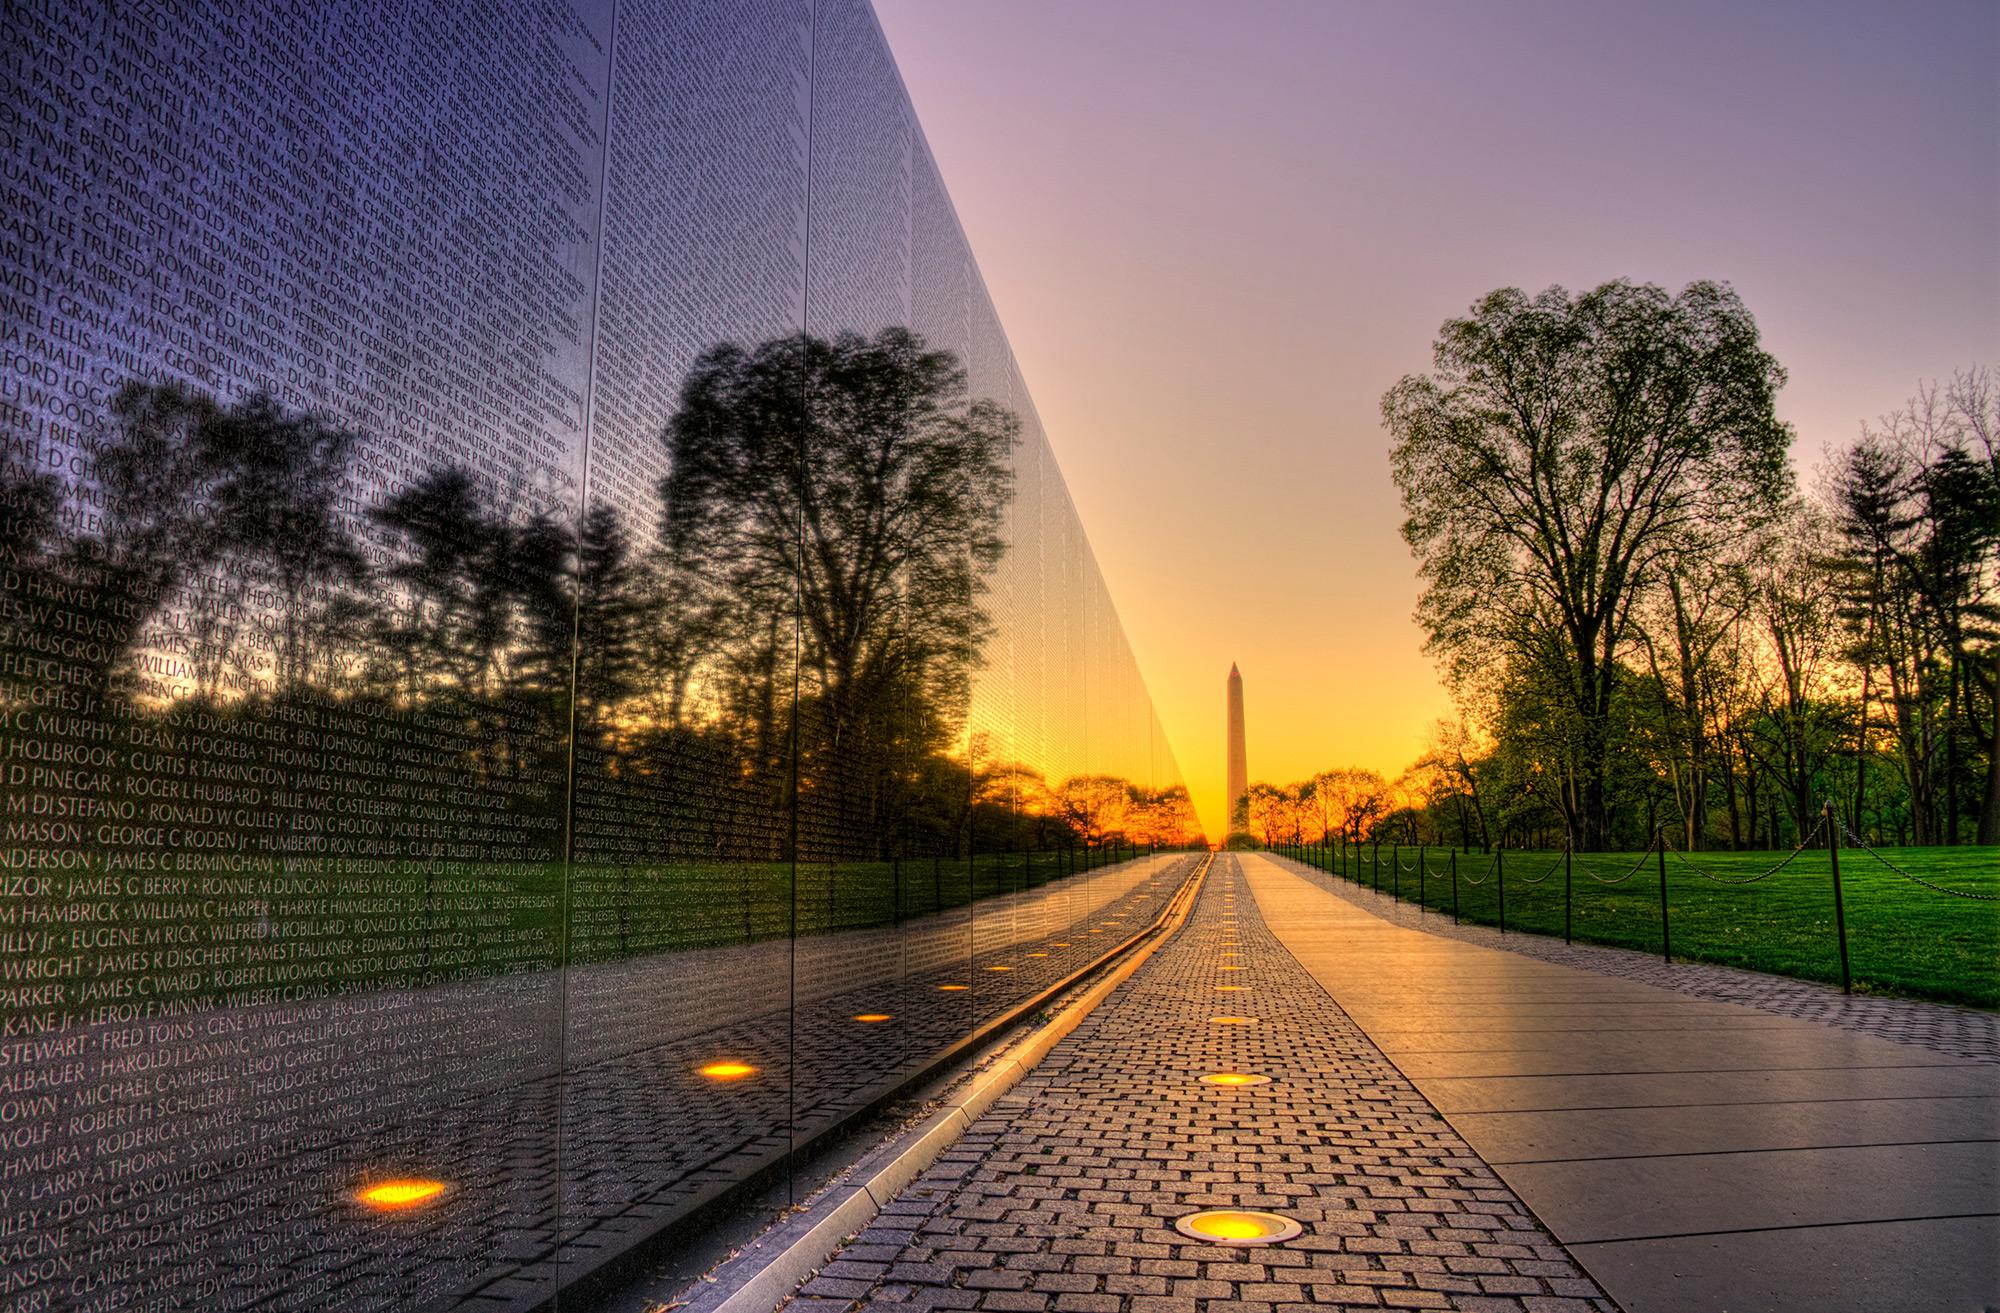 Vietnam memorial wall Washington